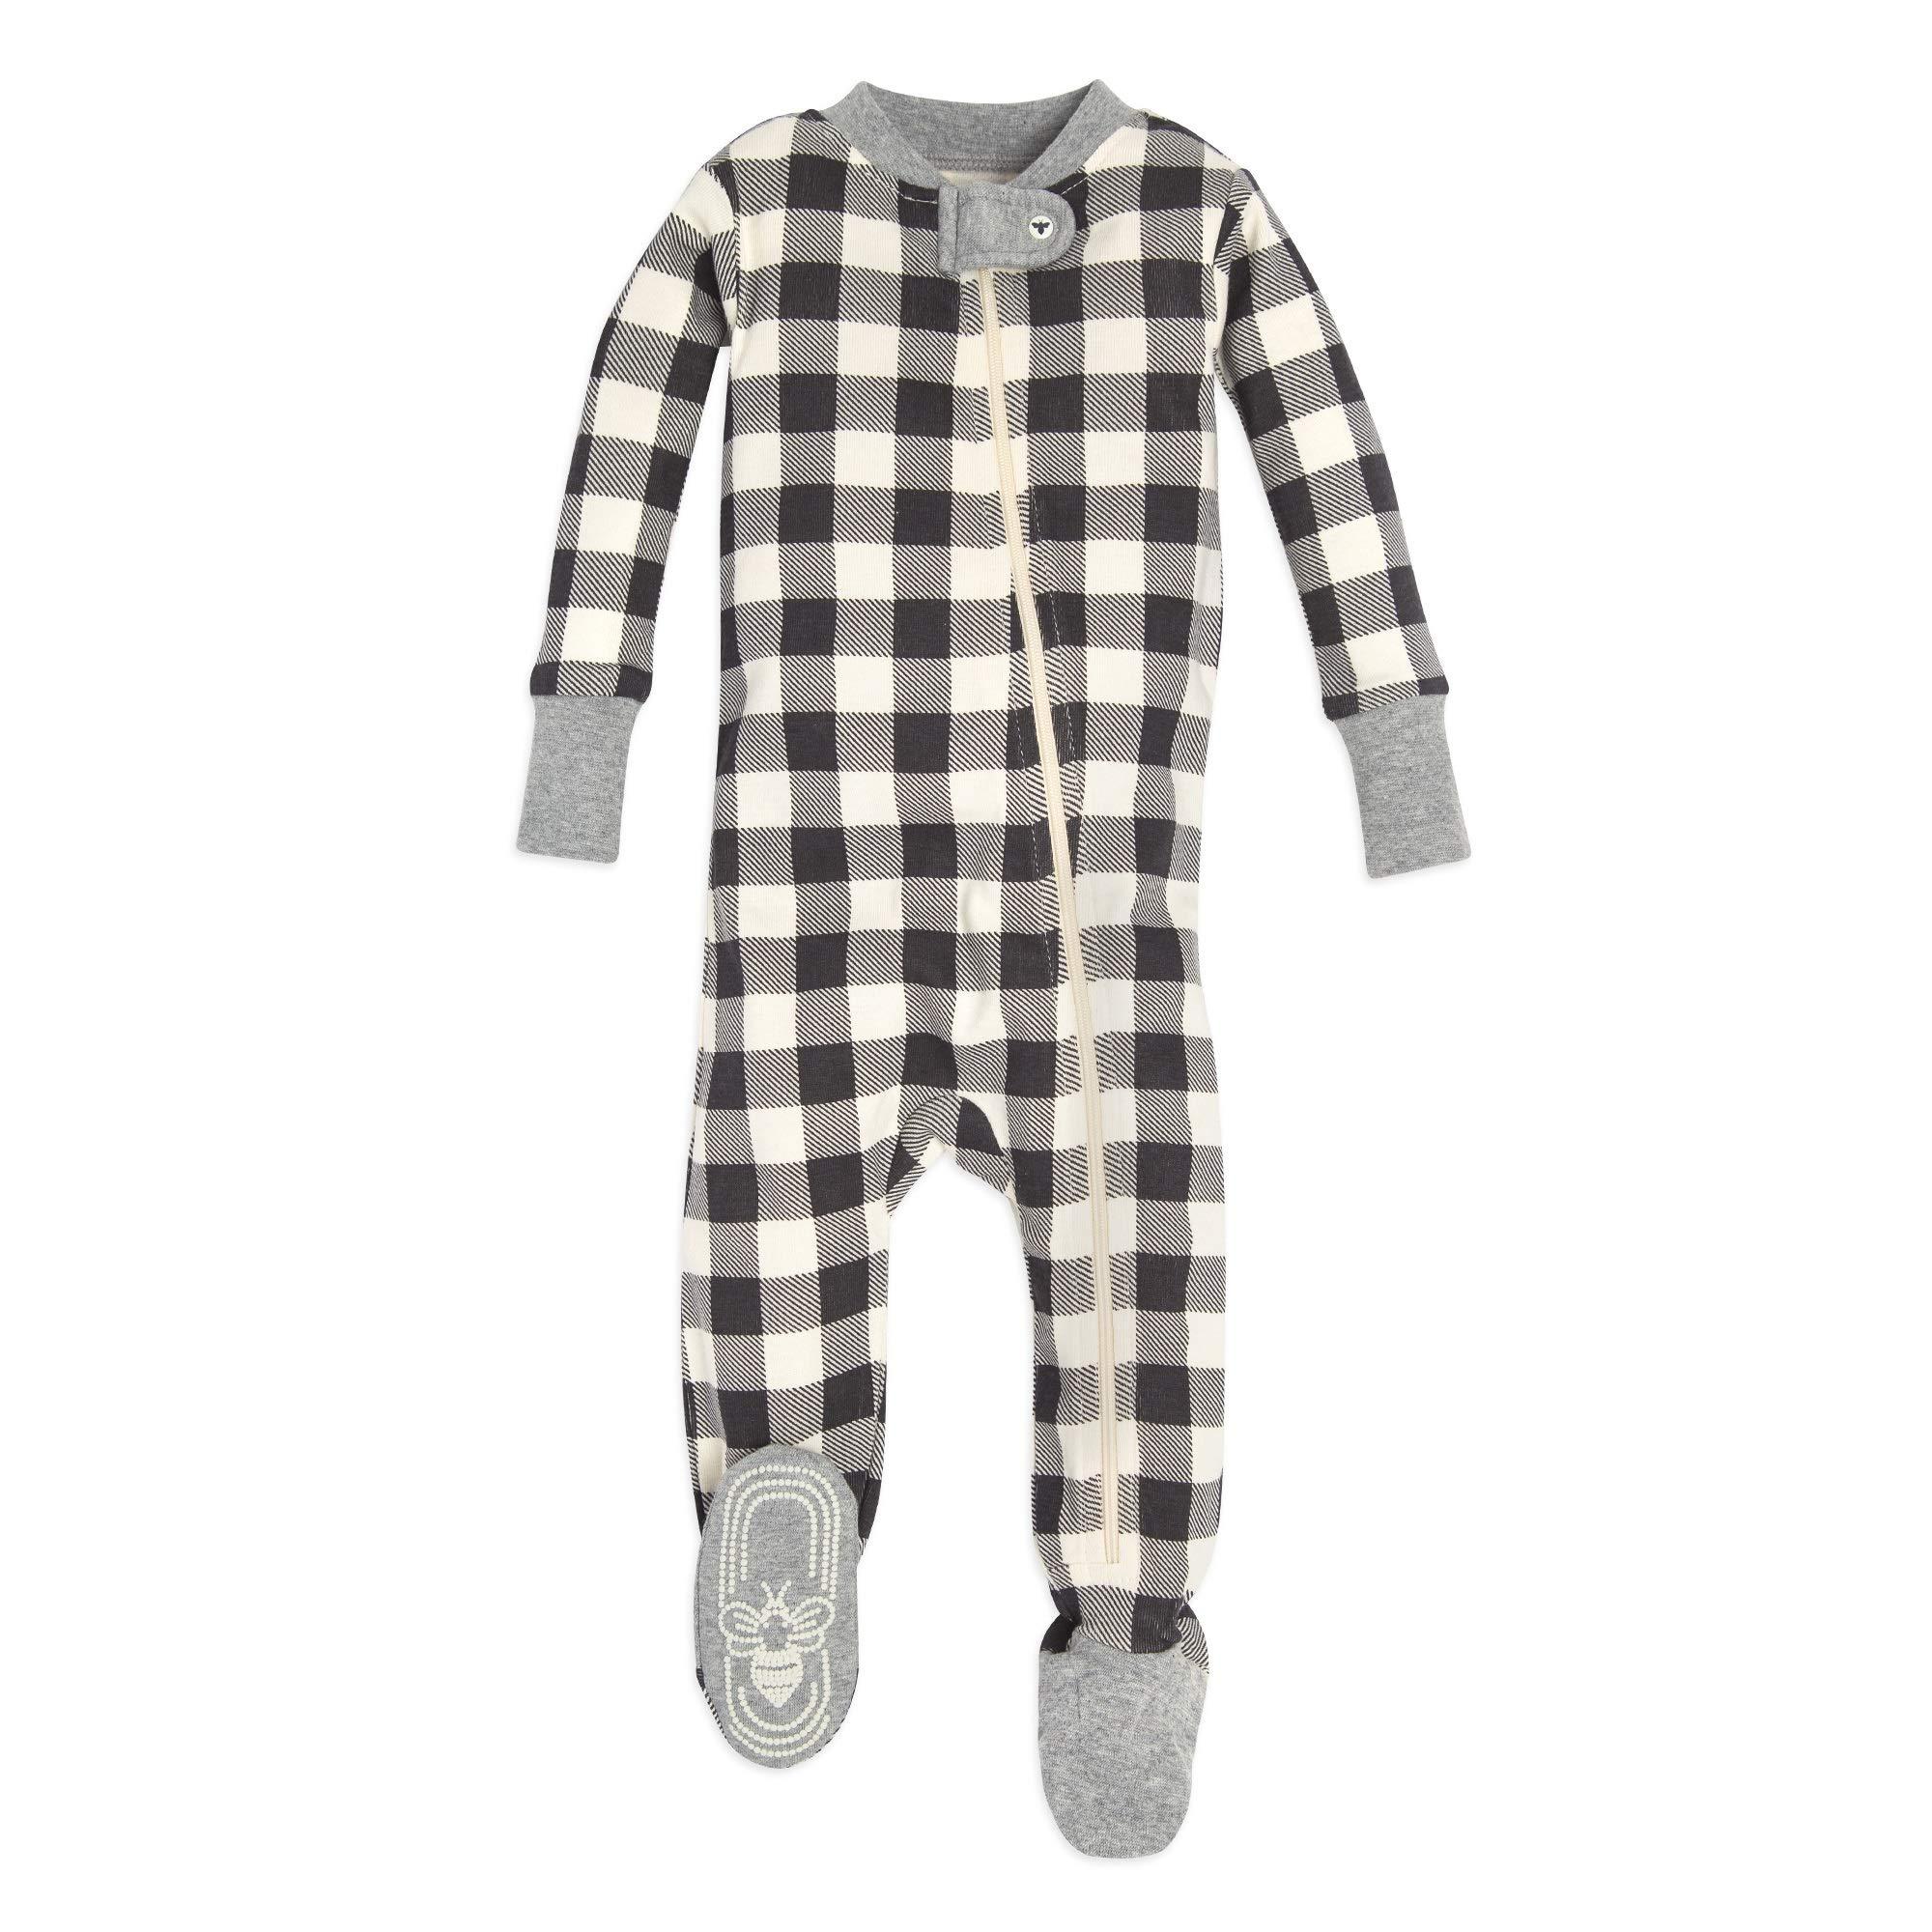 Newborn Midnight Twinkle Bee Zip-Front Non-Slip Footed Sleeper PJs Organic Cotton Burts Bees Baby Baby 1-Pack Unisex Pajamas